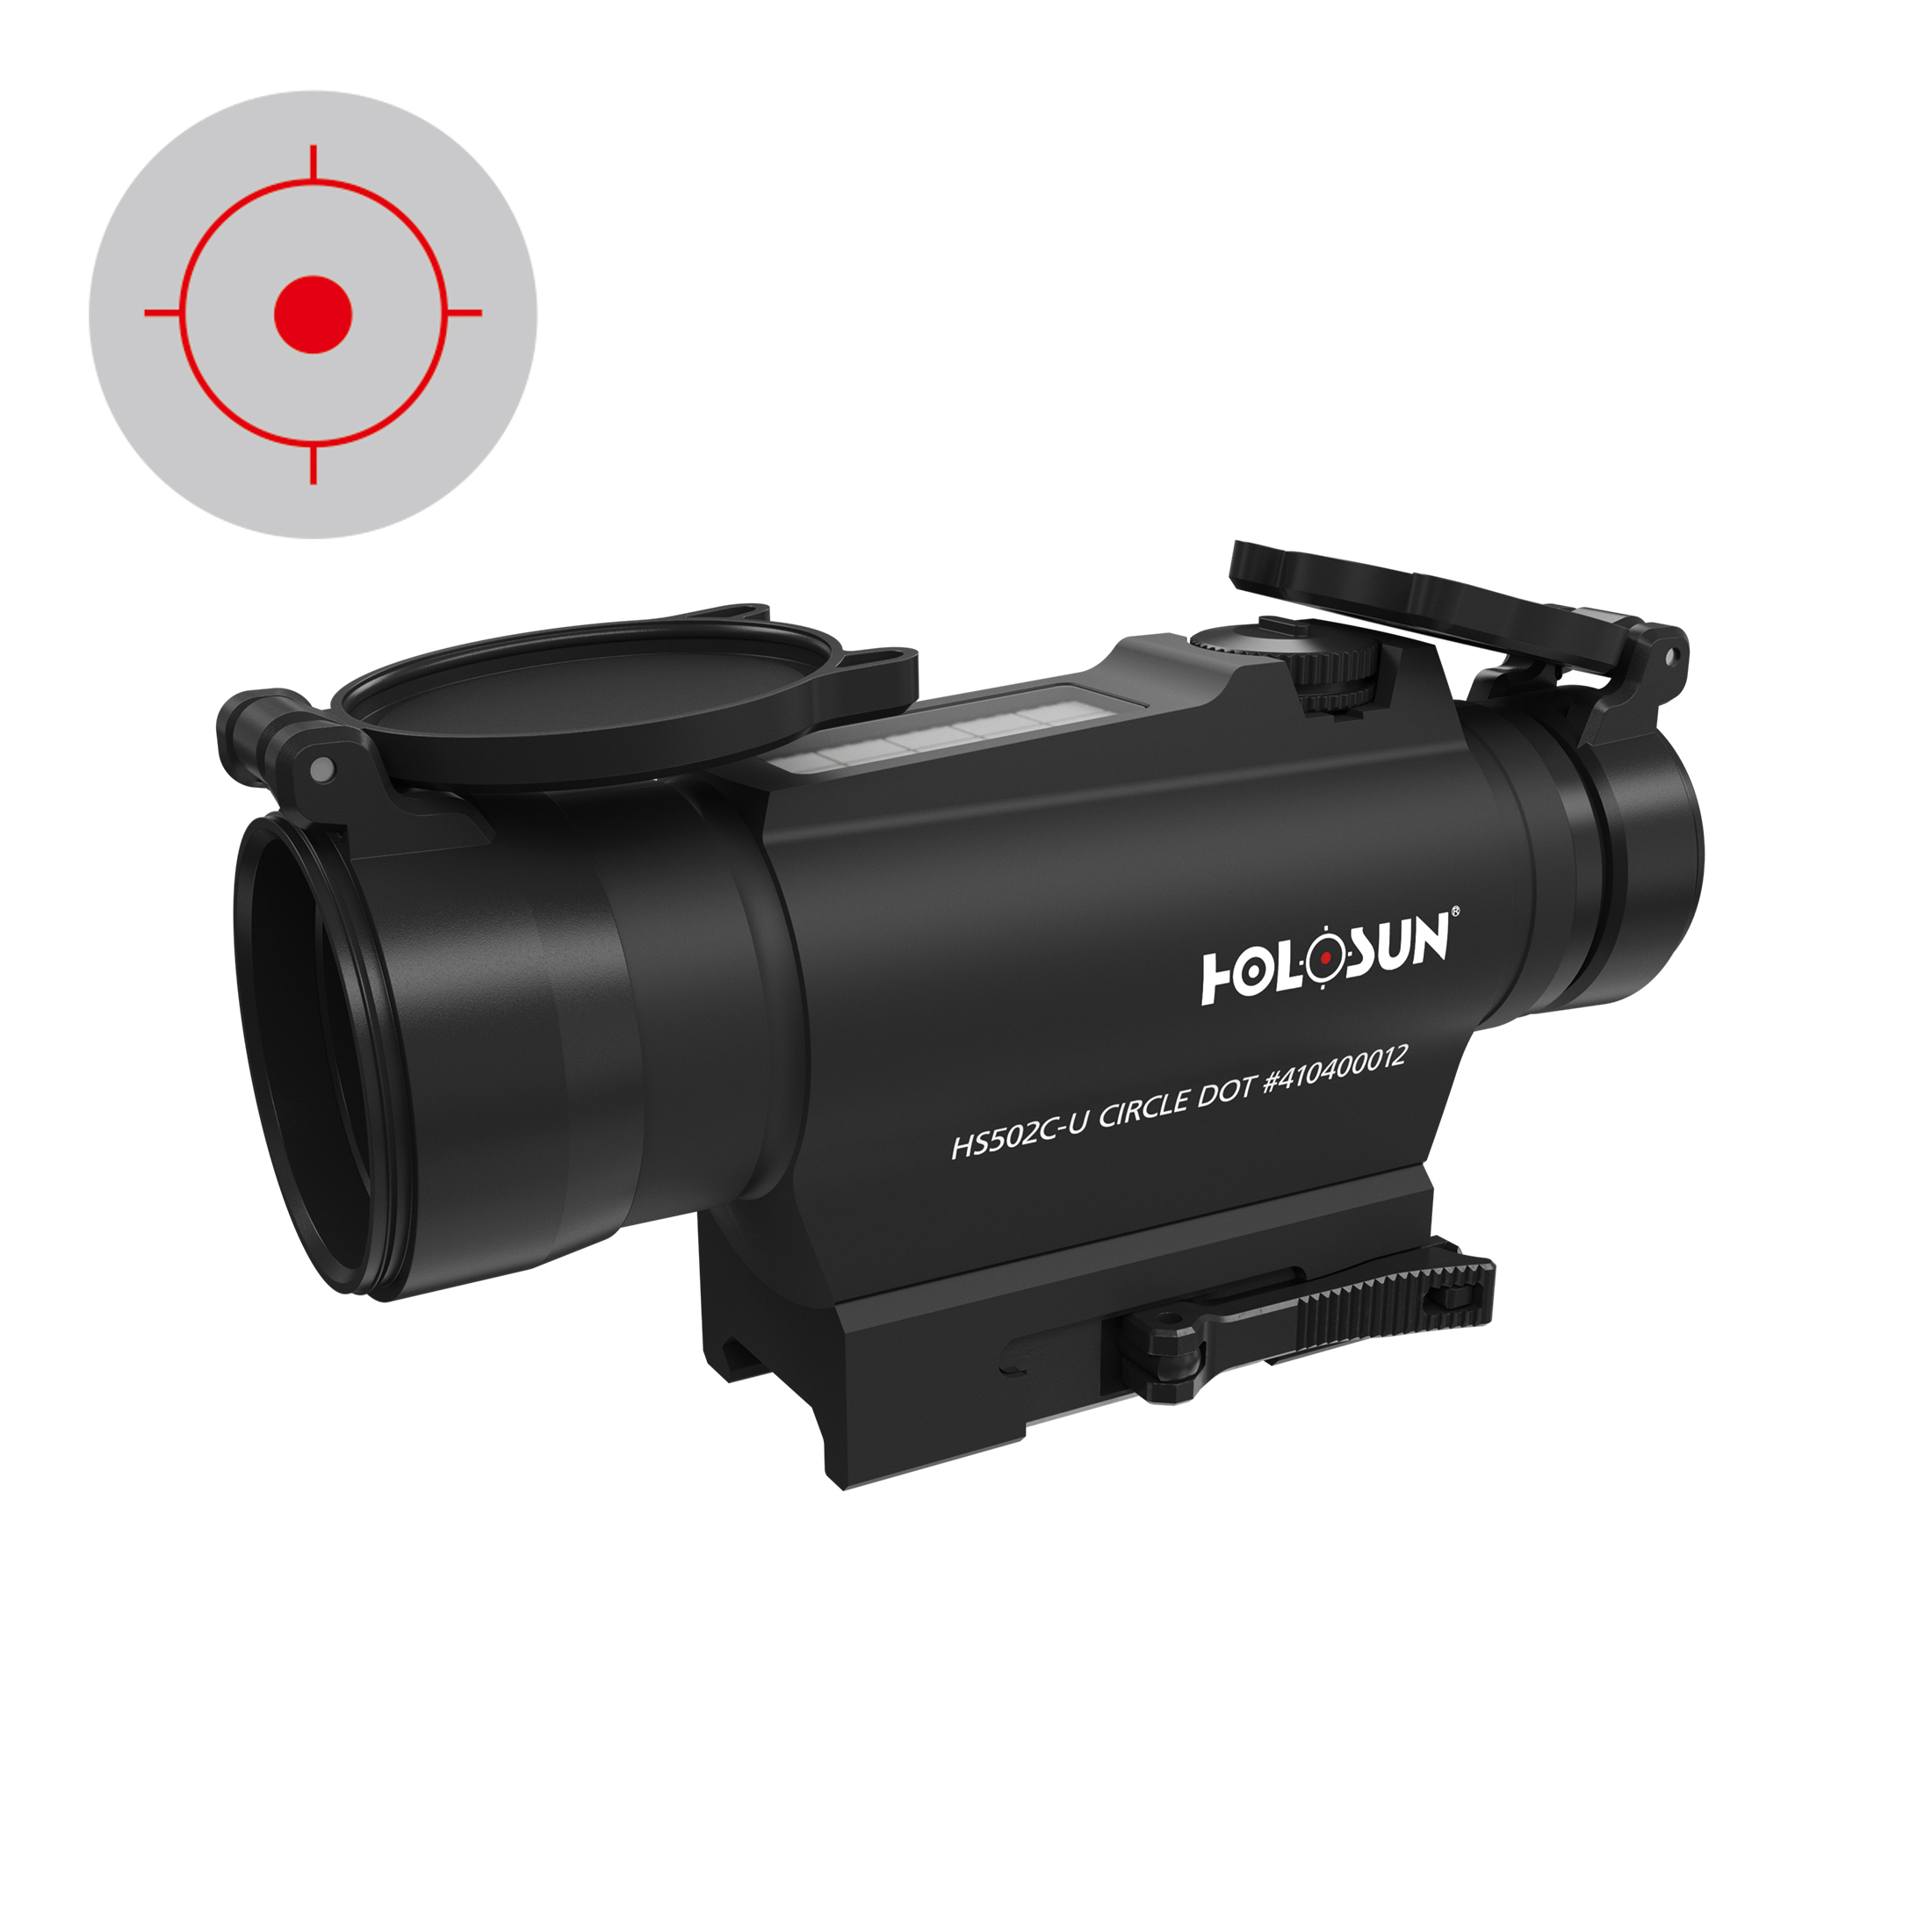 Holosun CLASSIC HS502C-U-RENEWED